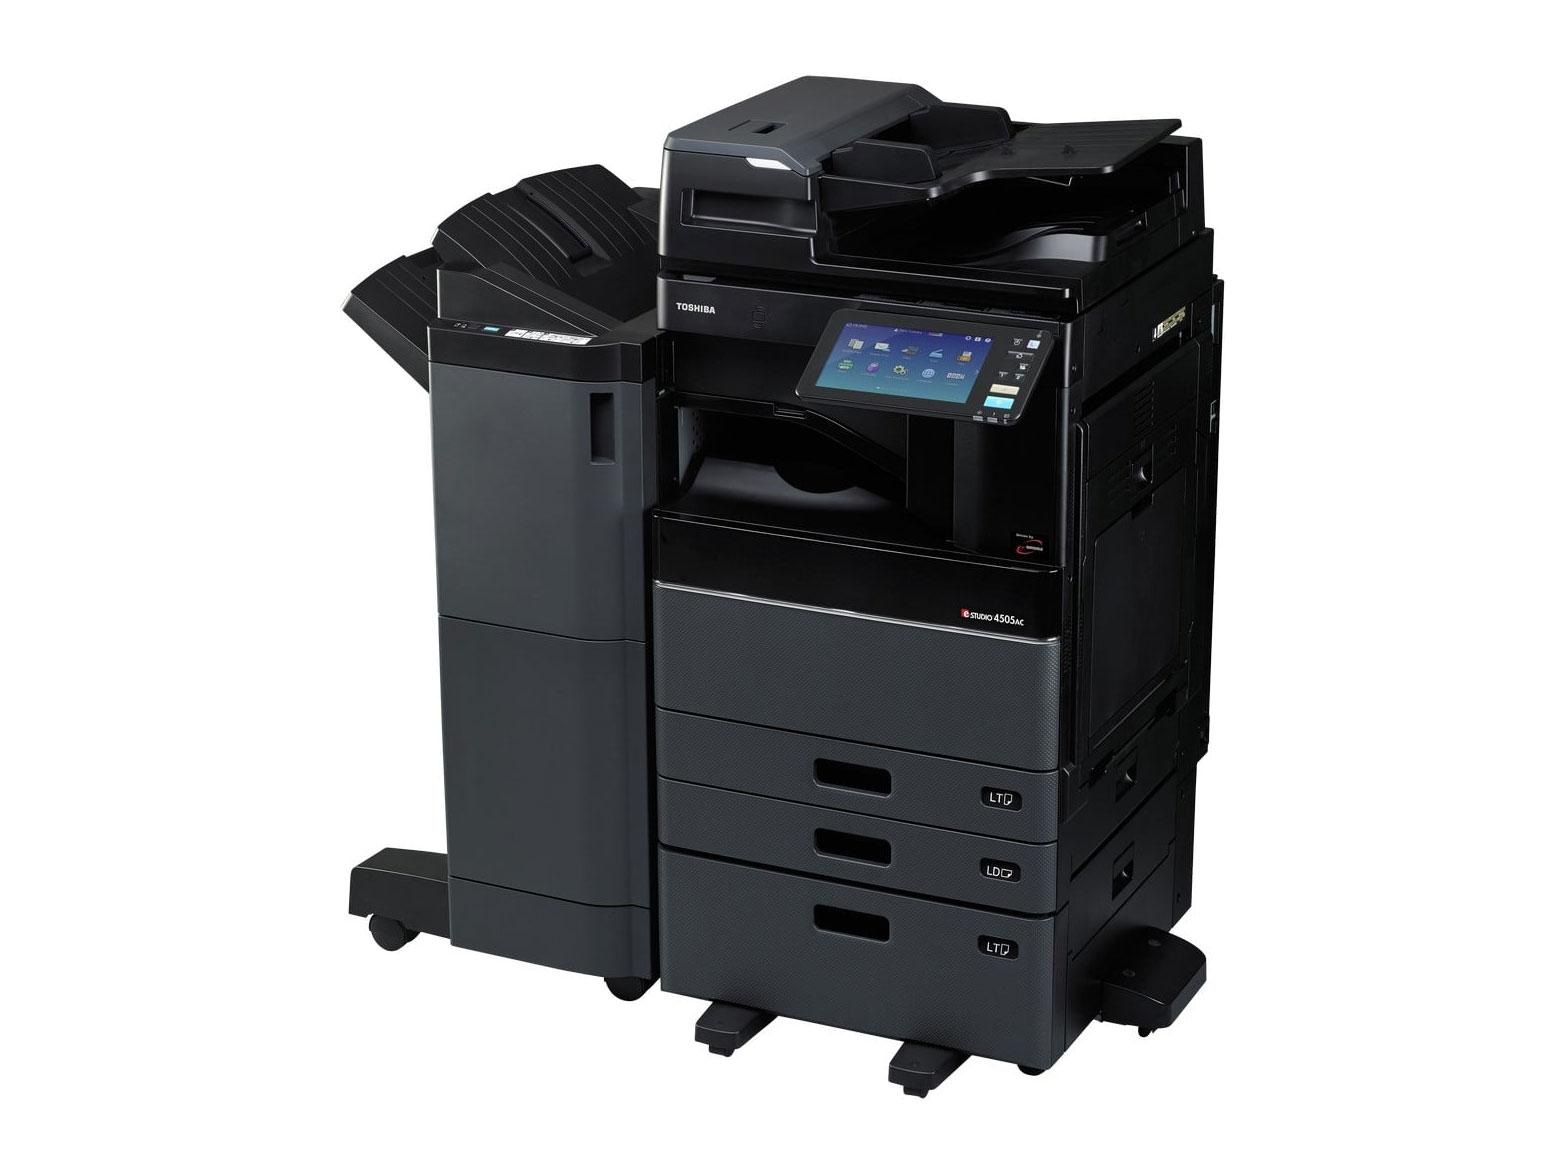 Fotocopiadora Toshiba e-STUDIO 4505AC Barata